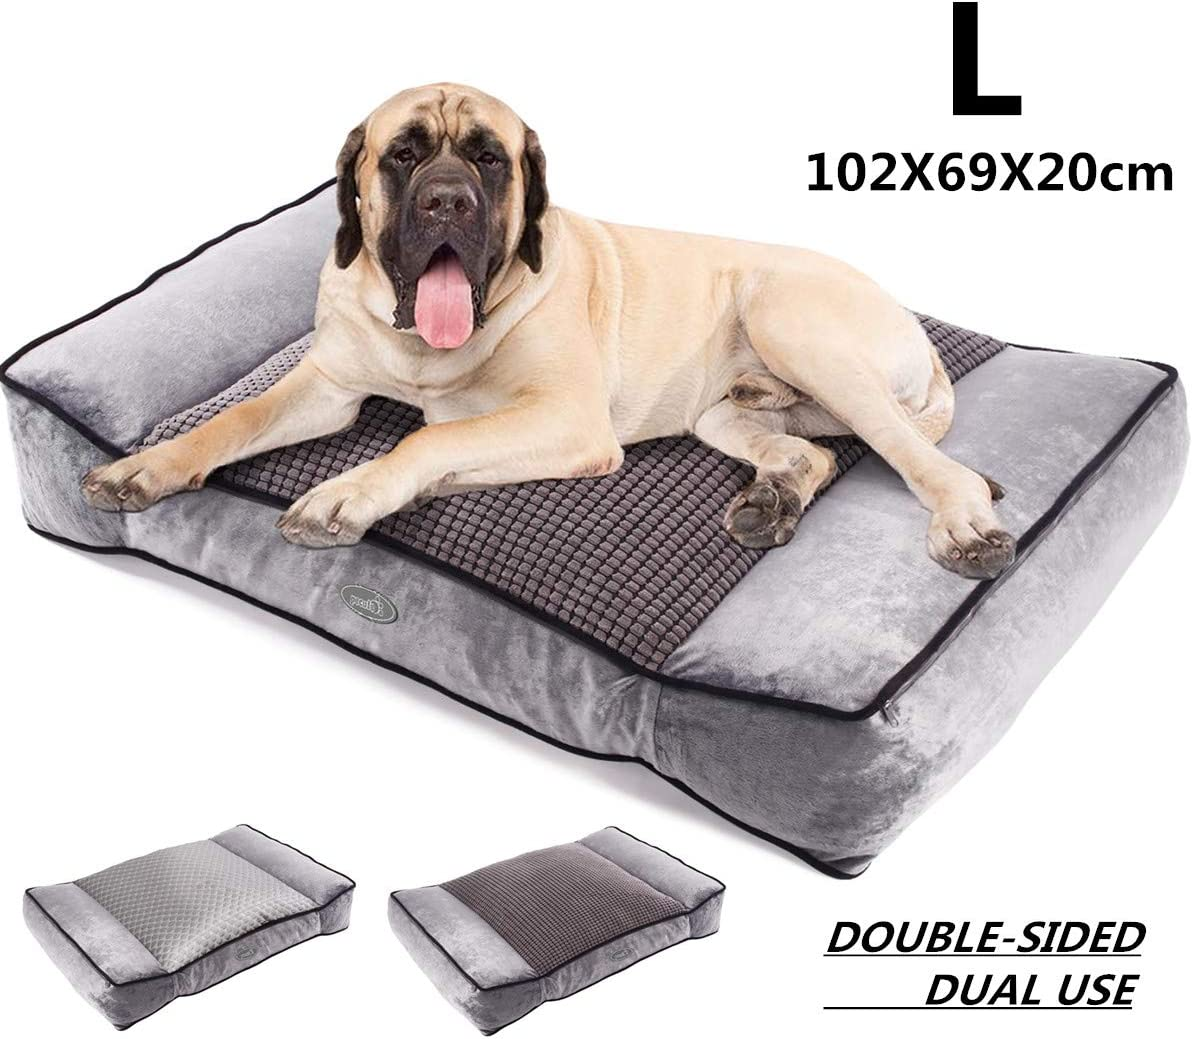 Pecute Camas para Perros Grandes de Dos Caras Colchón Perro Lavable Suave, 102X69X20cm Almohadas para Camas para Perros Gris (L, Gris)